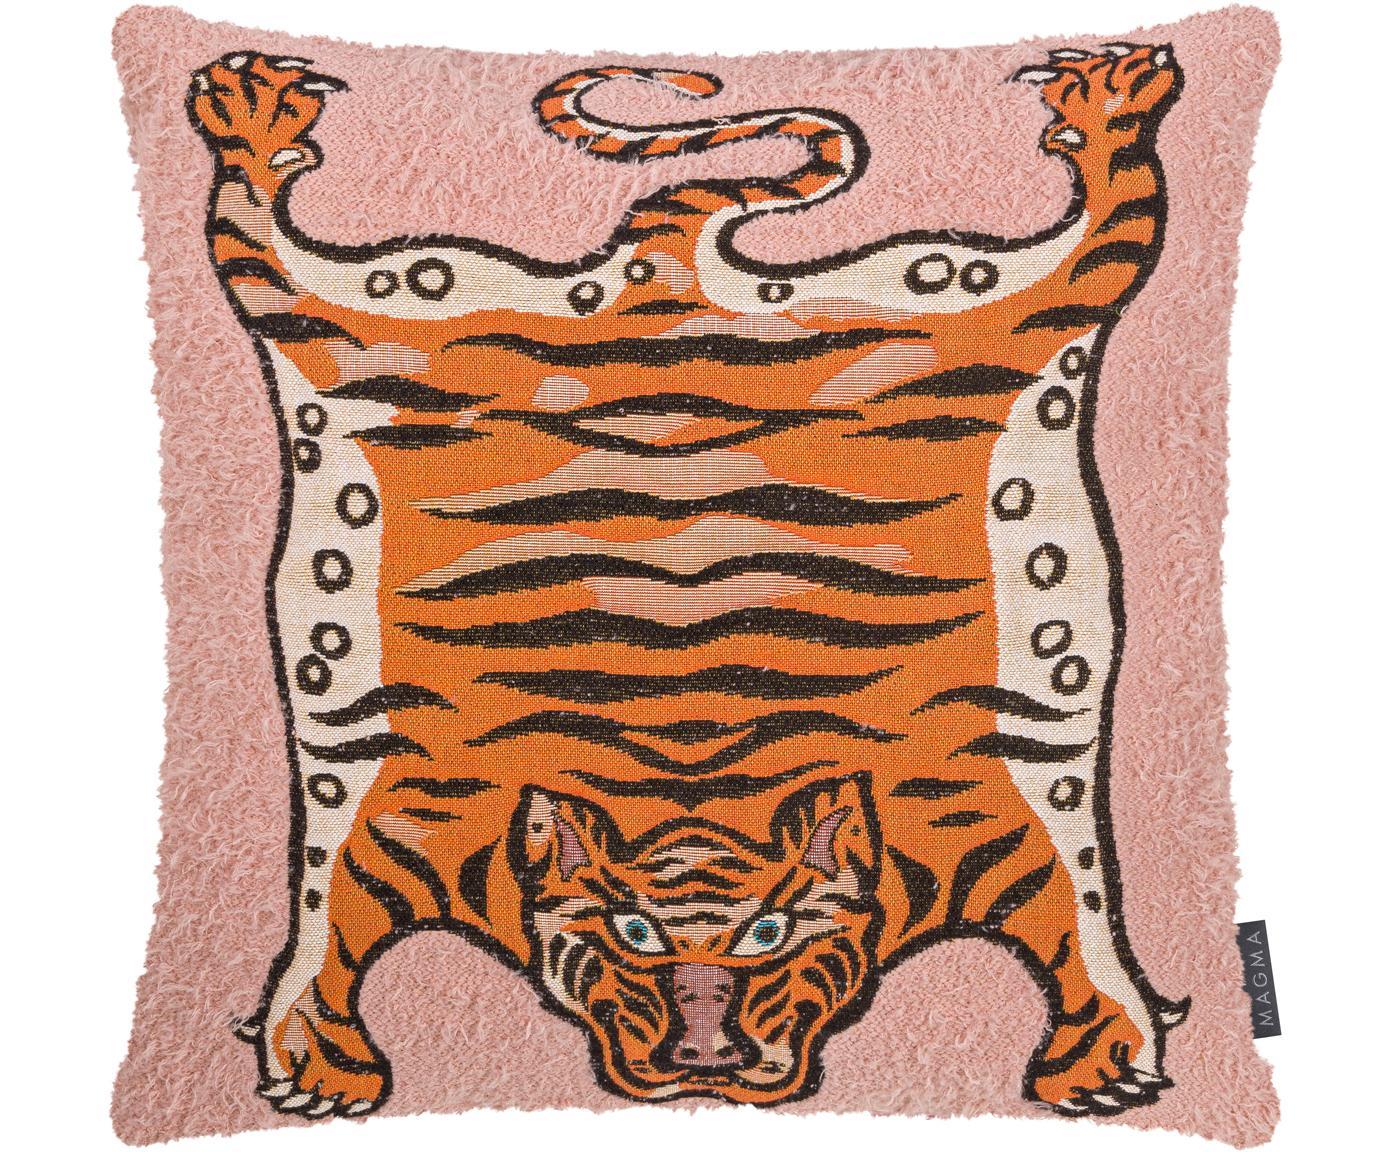 Kissenhülle Tigris, Webart: Jacquard, Rosa, Orange, Schwarz, 45 x 45 cm